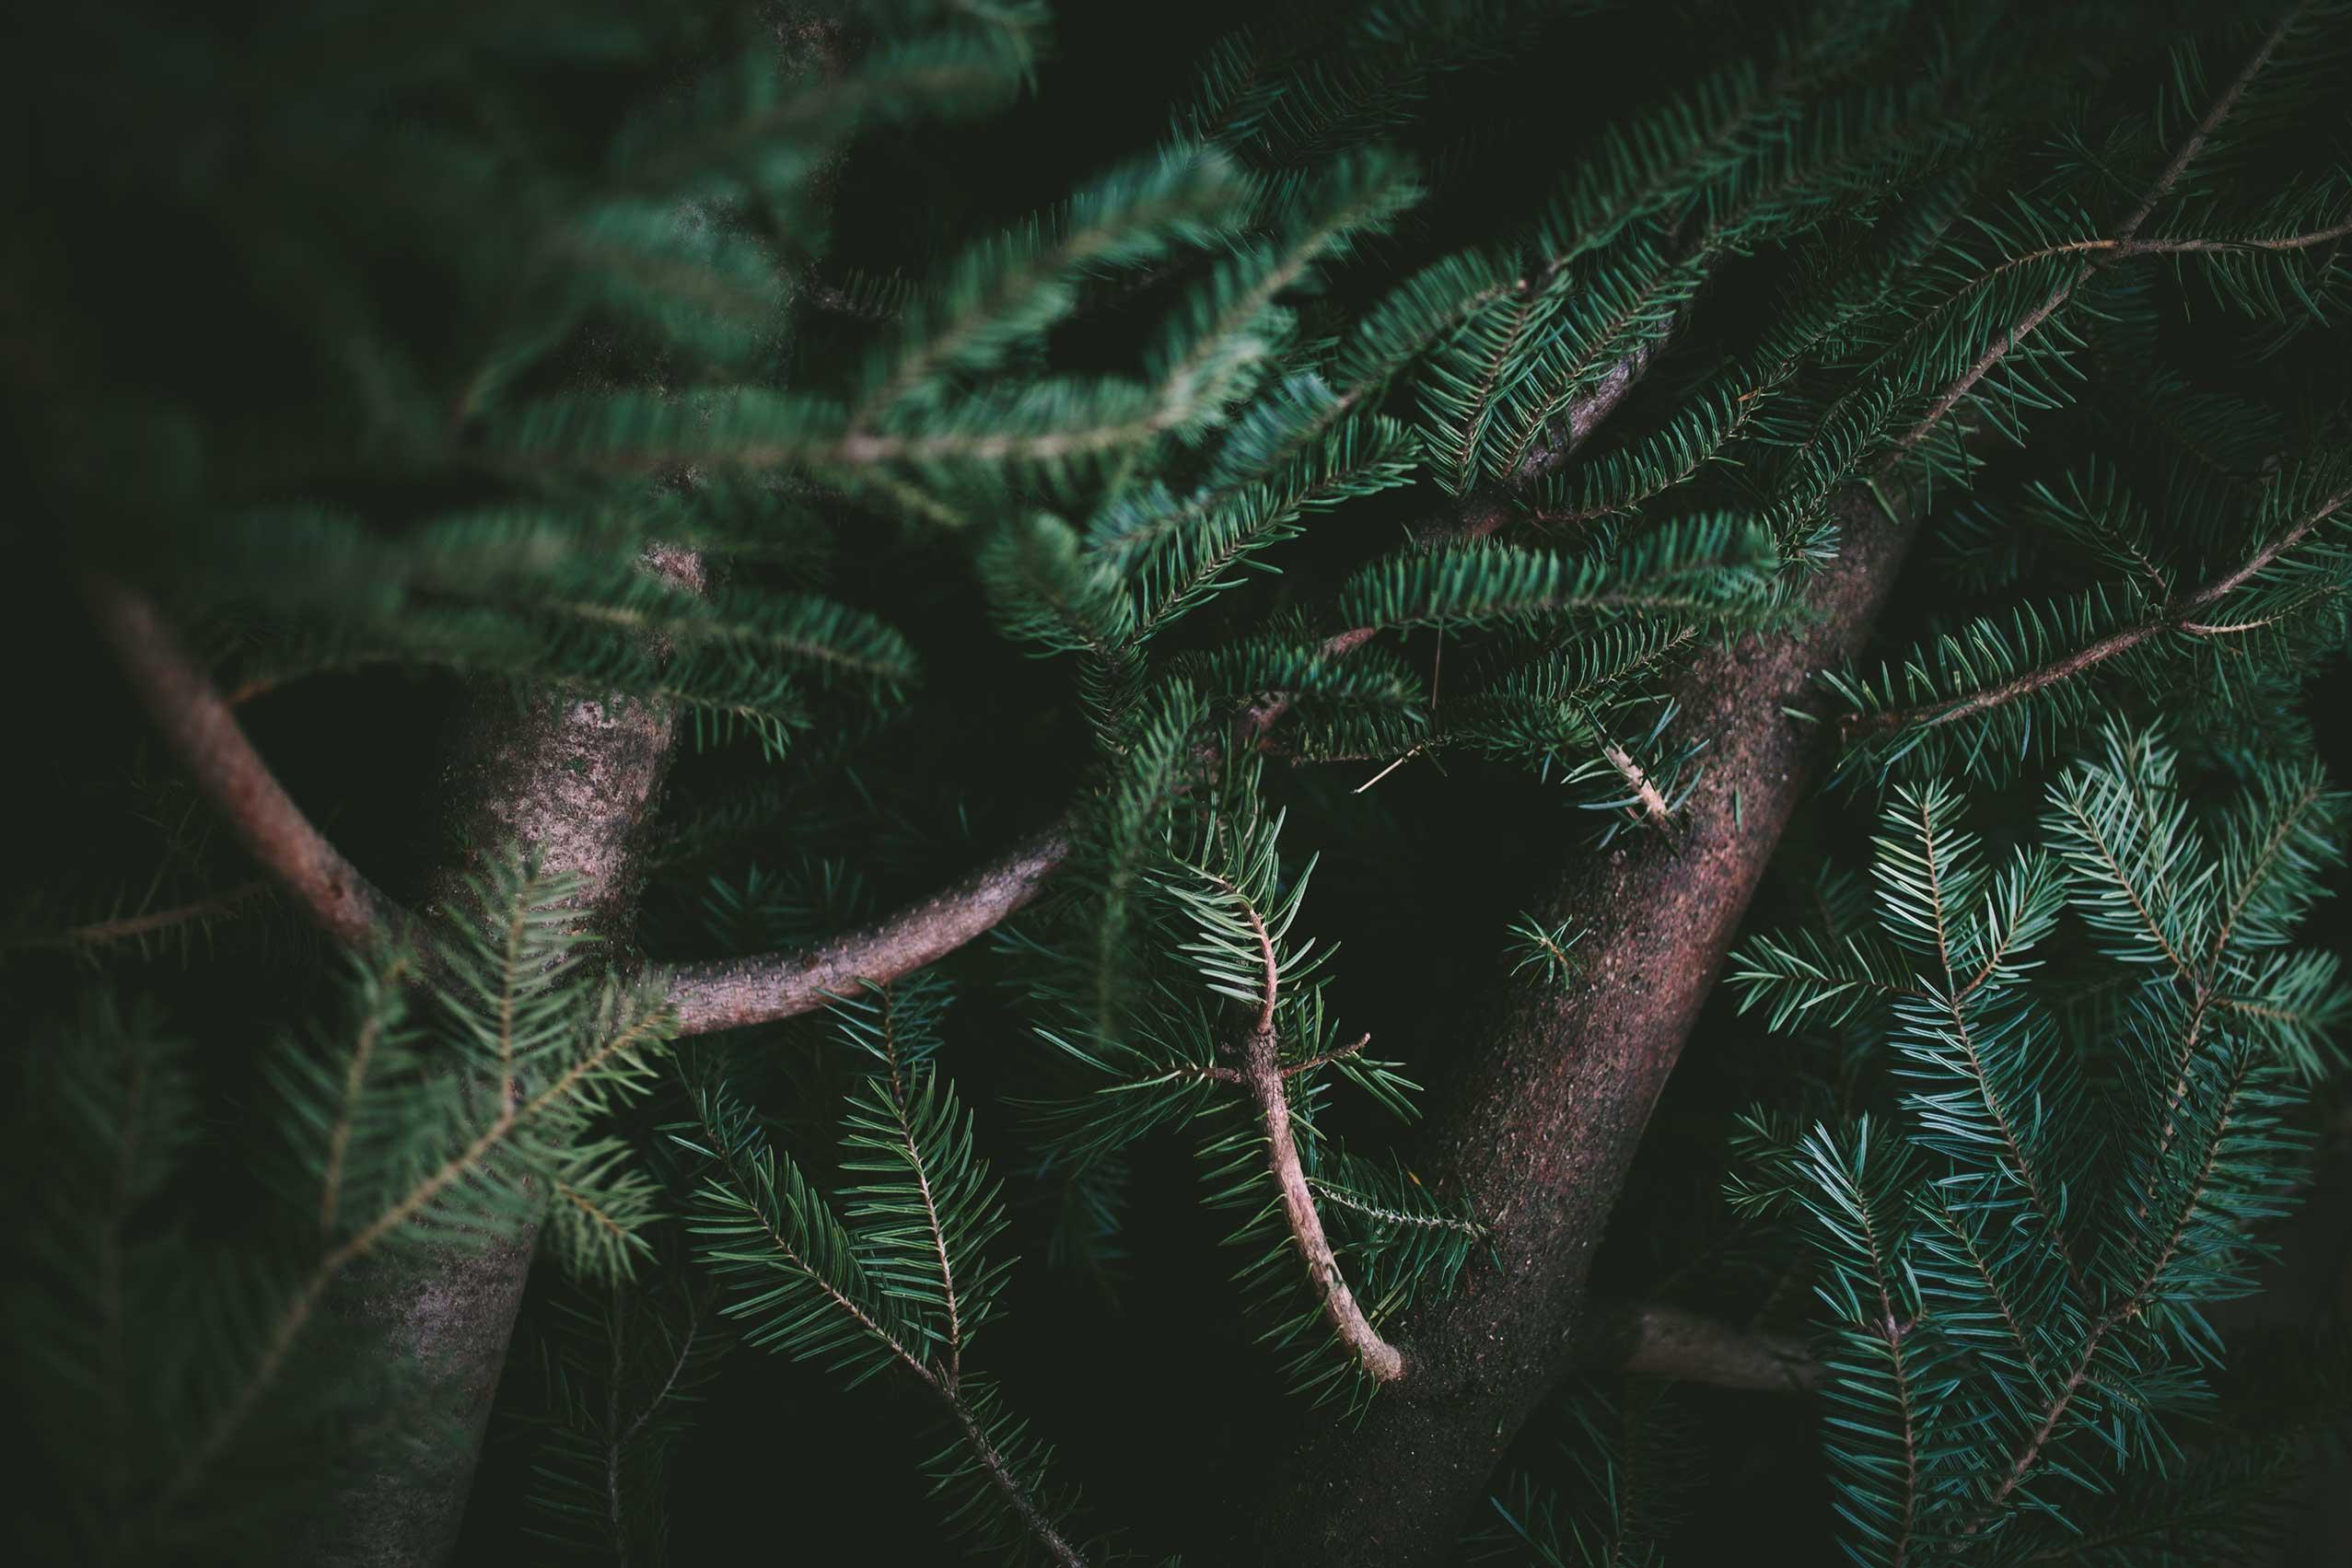 The Golden Christmas Reveillon